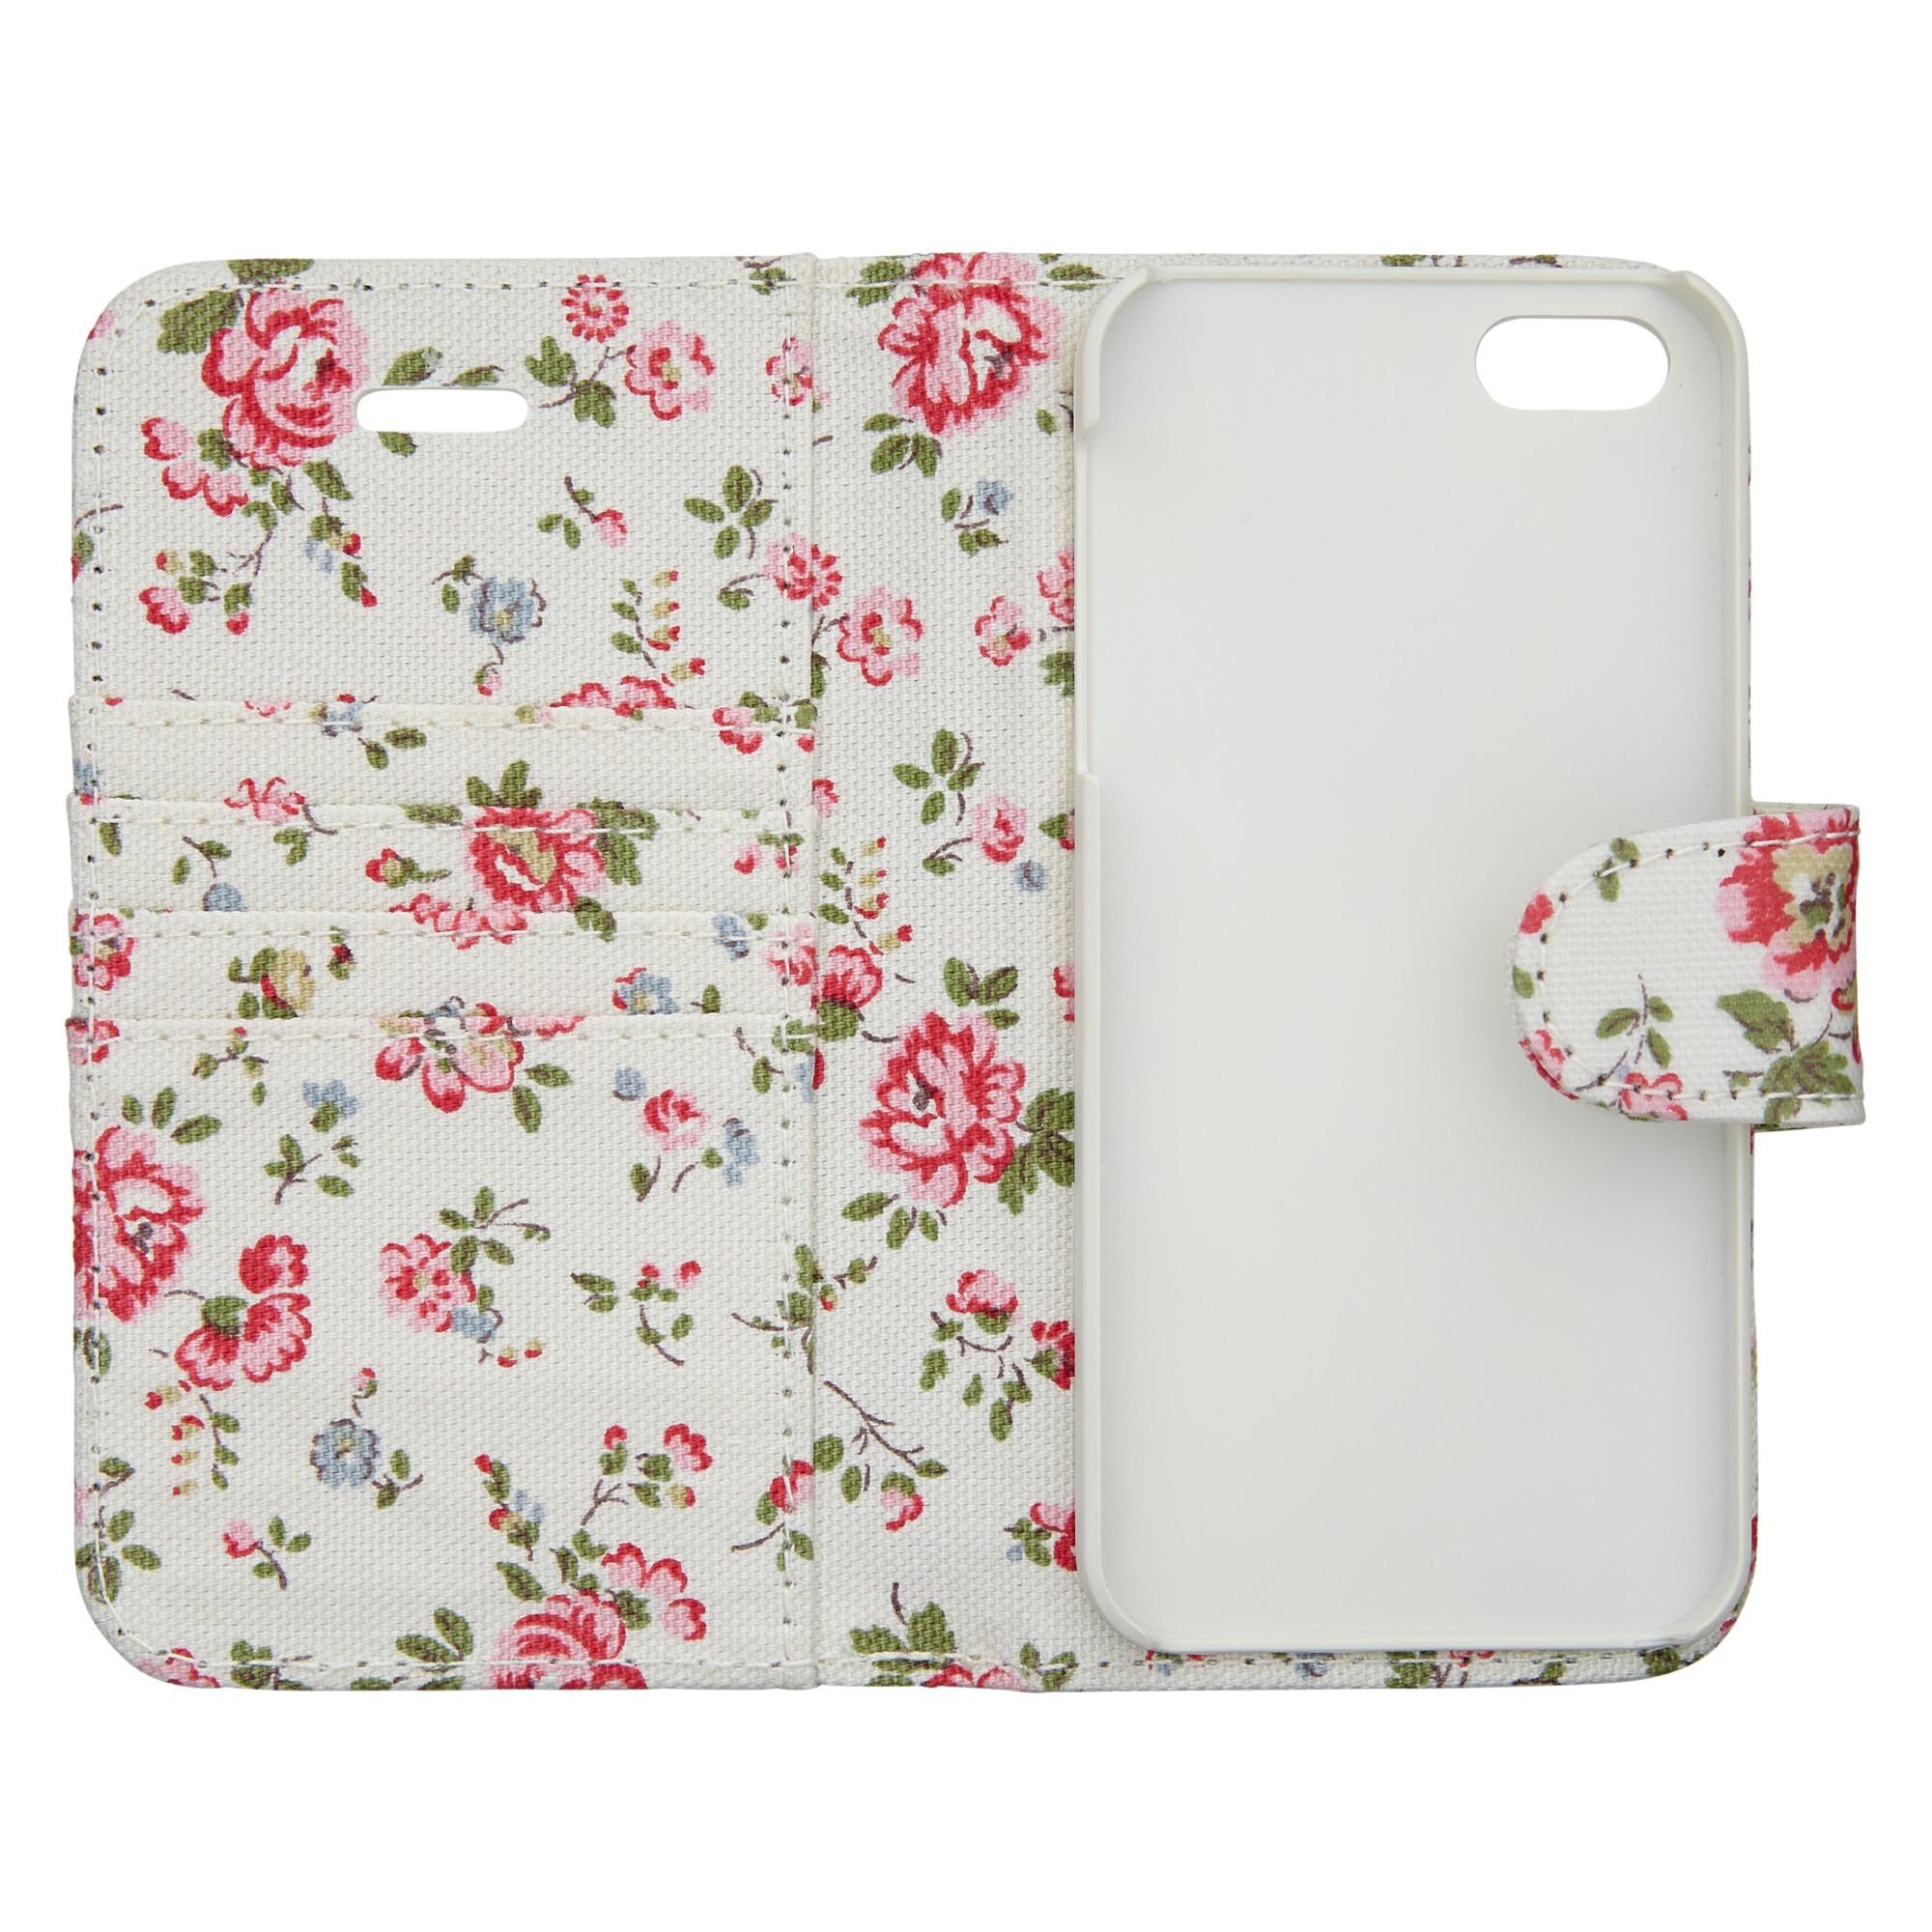 Cath Kidston Bramley Print Iphone 5 Case - Lyst bbf70cf99c